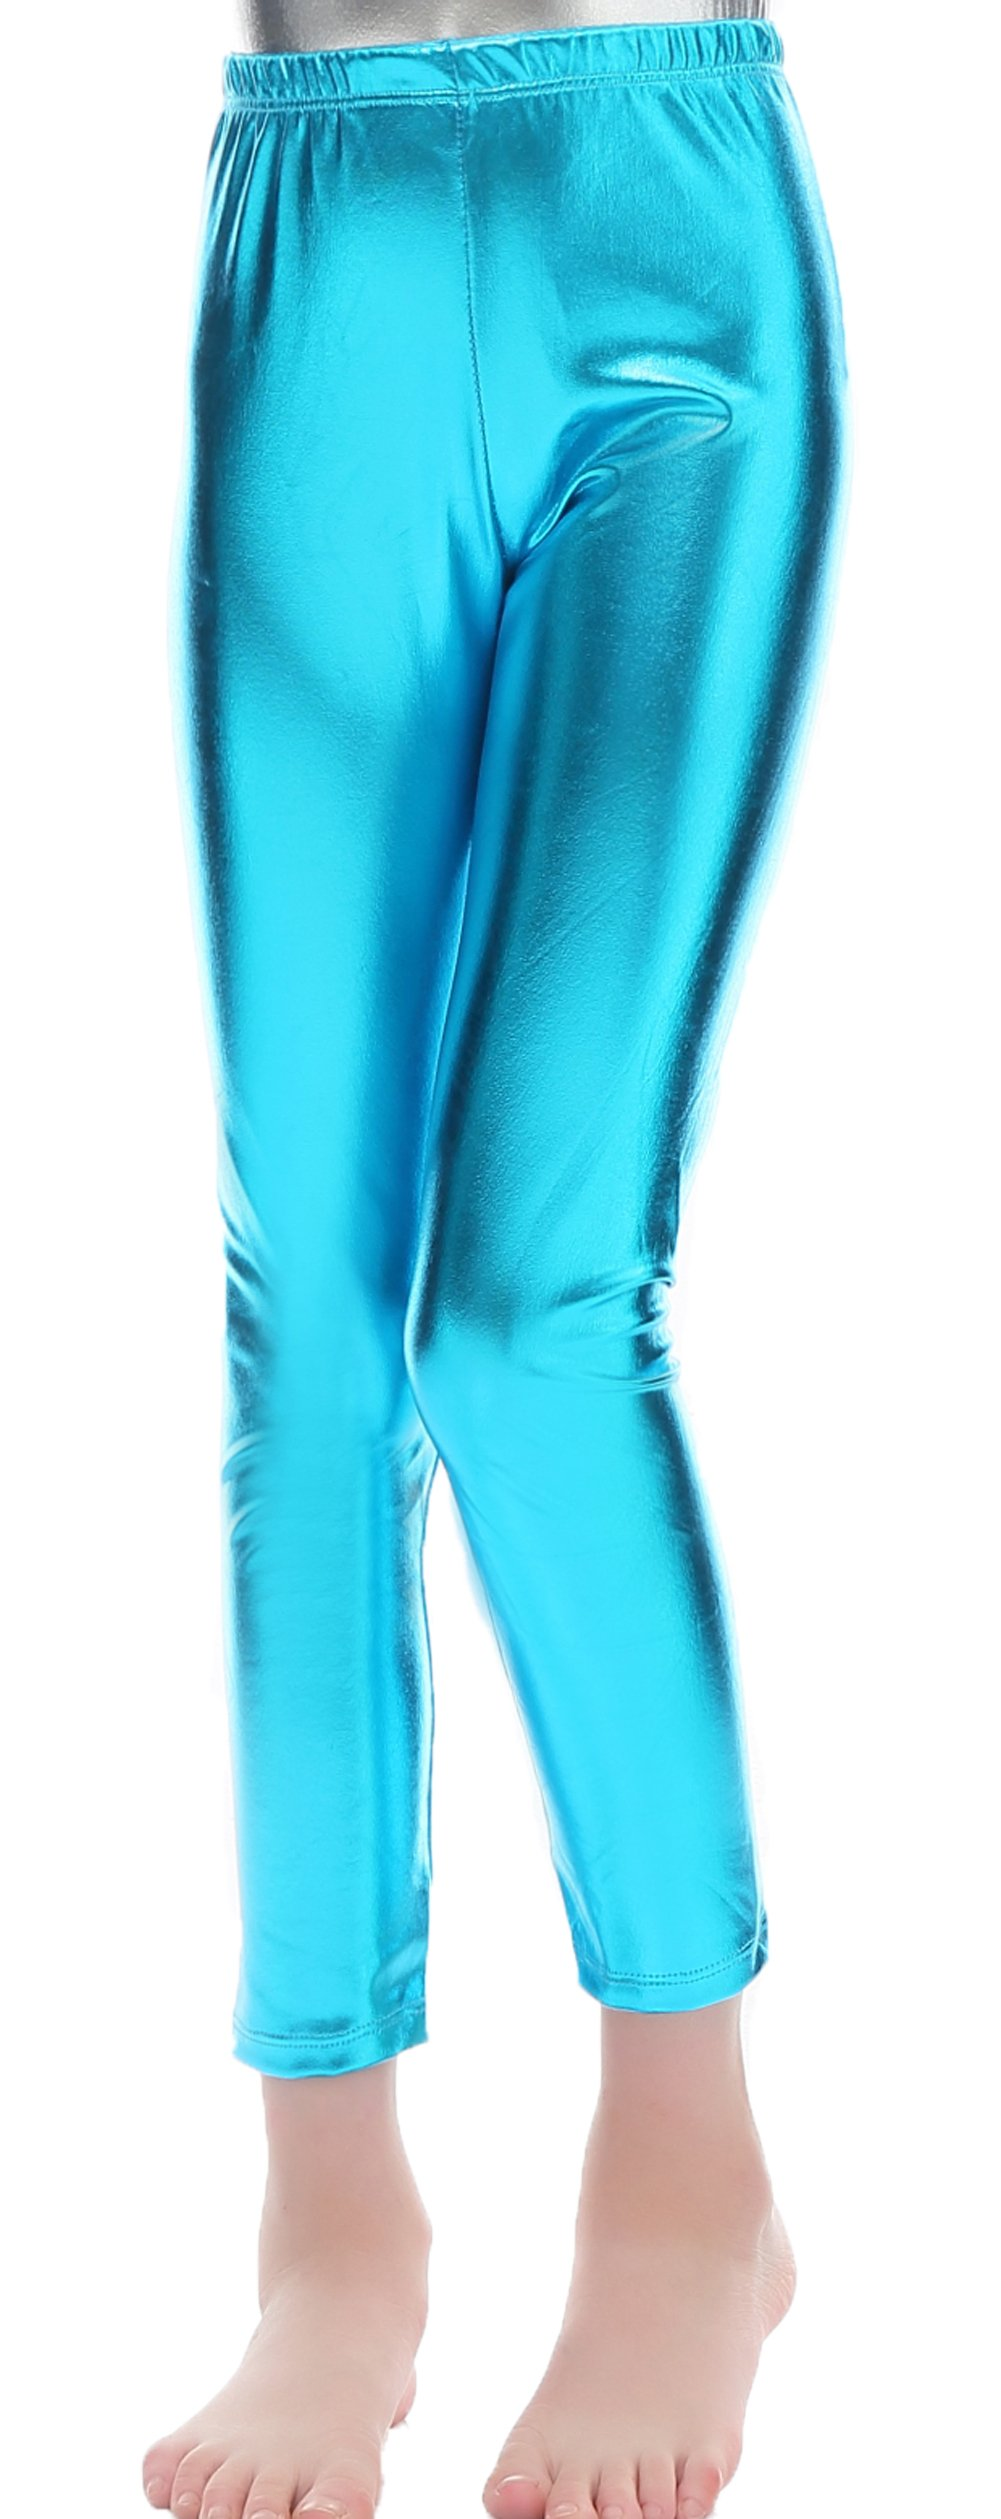 Speerise Girls Kids High Waisted Shiny Metallic Dance Fashion Leggings, Turquoise, 4-6